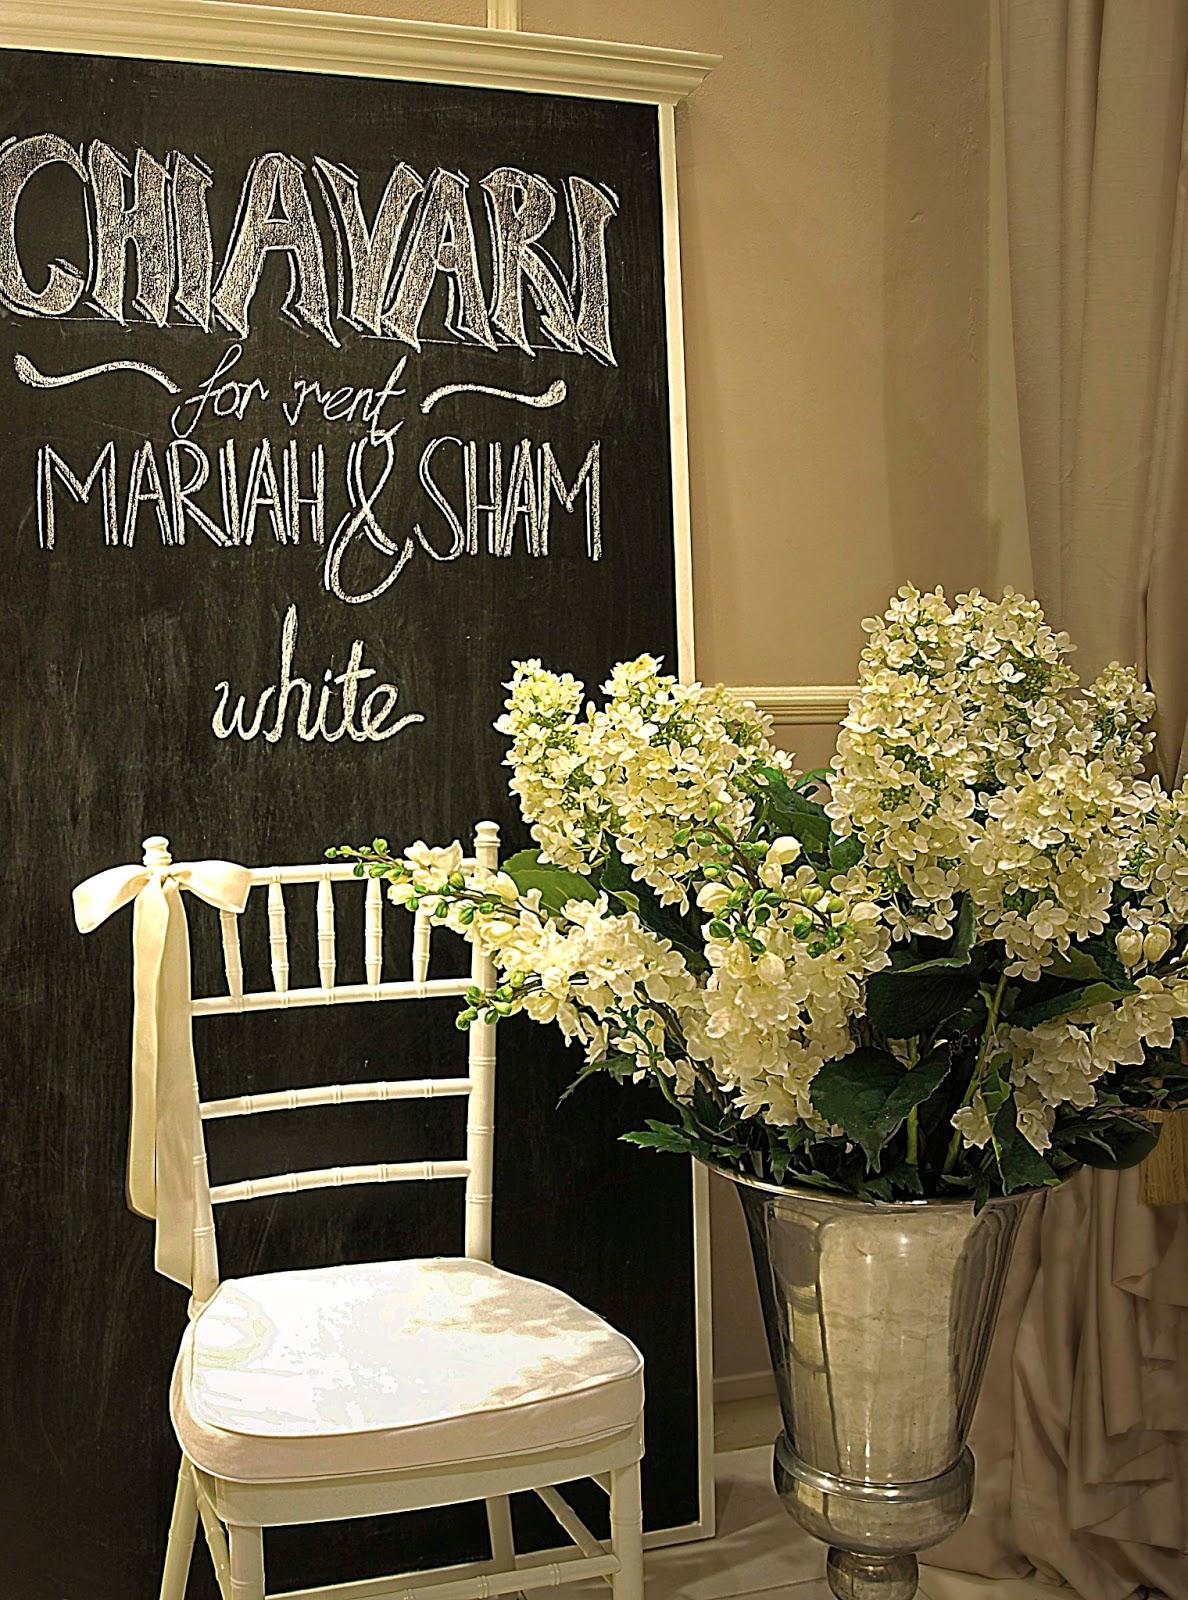 Tiffany Wedding Chairs How To Make A Queen Throne Chair Mariah And Sham Chiavari Rental In Singapore